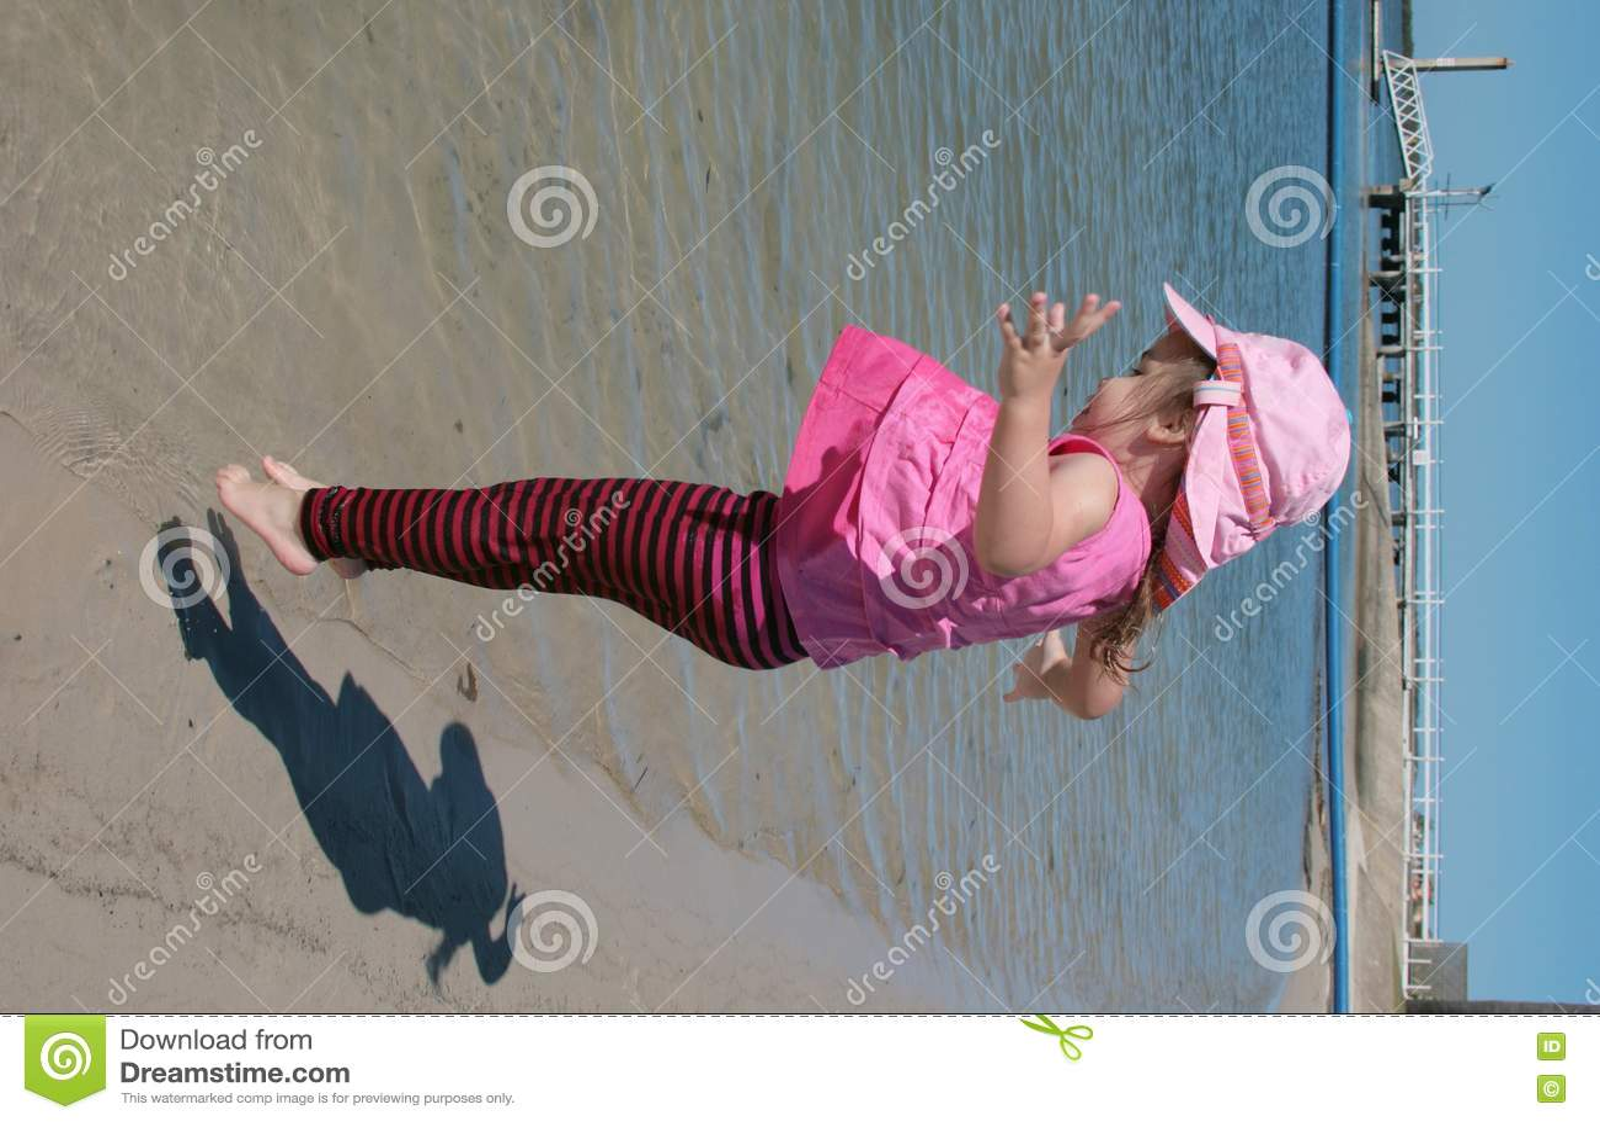 jump for joy stock photos image 3372513